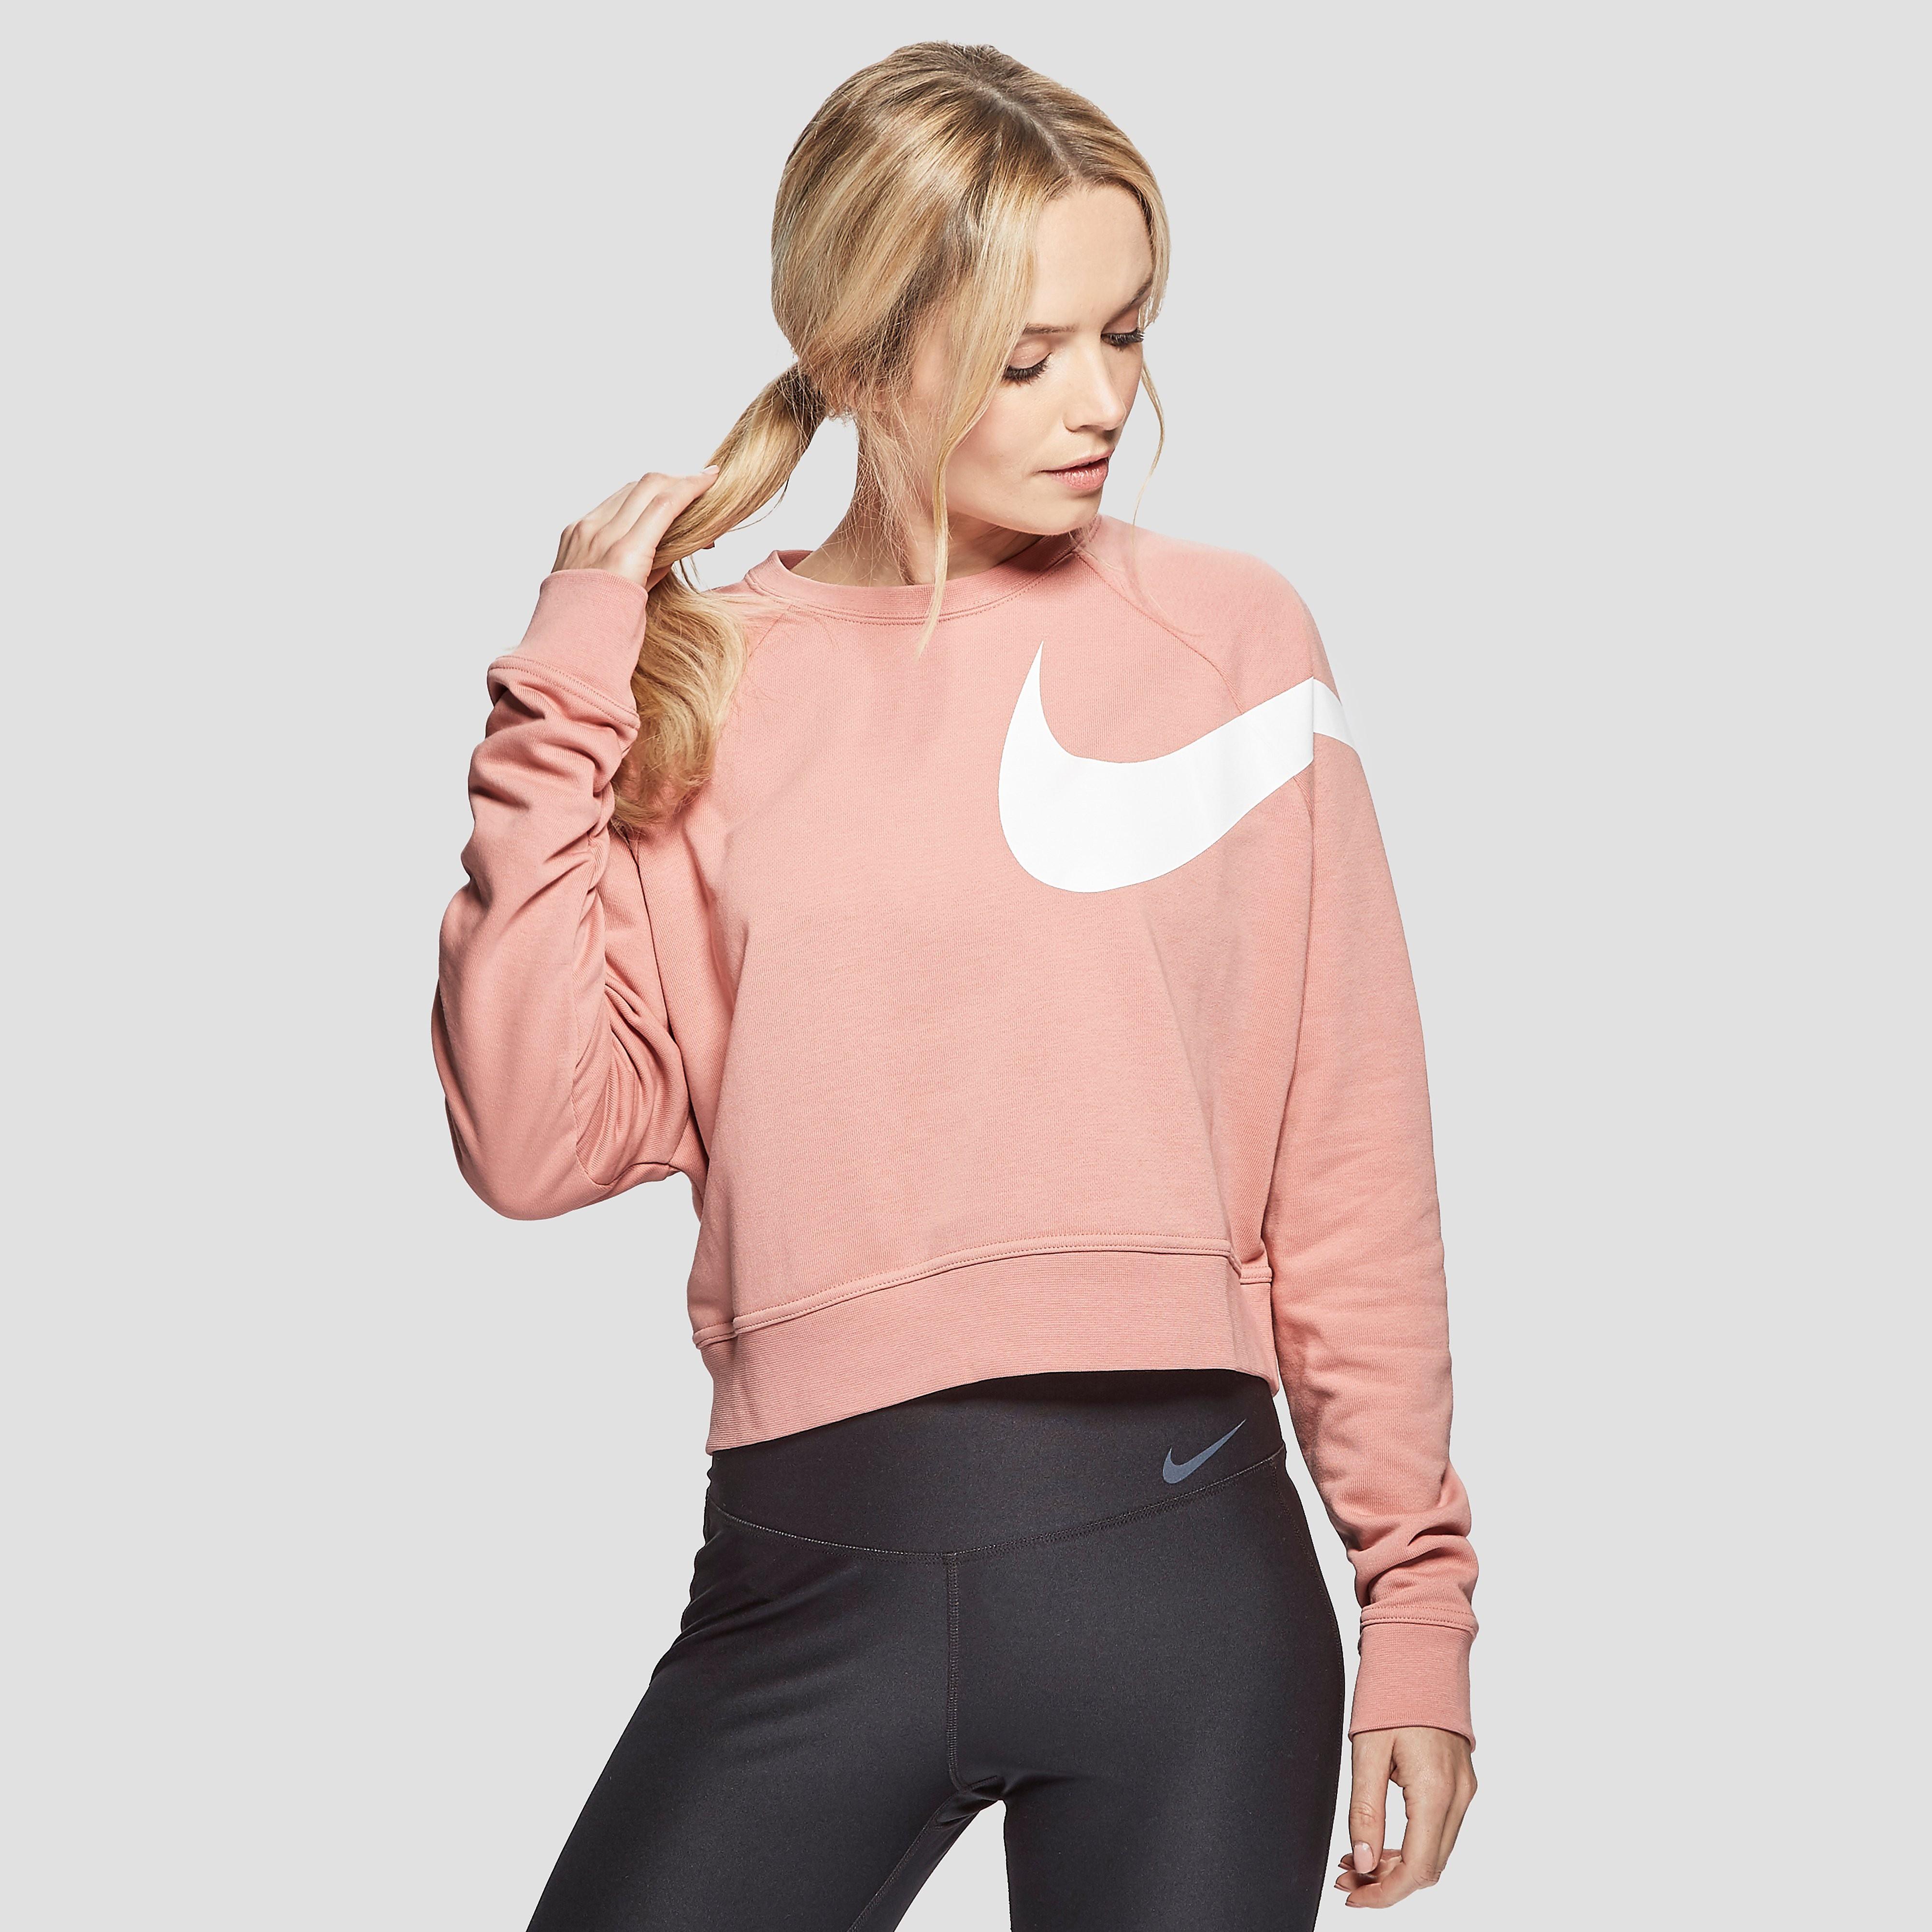 Nike Long Sleeve Versa Top